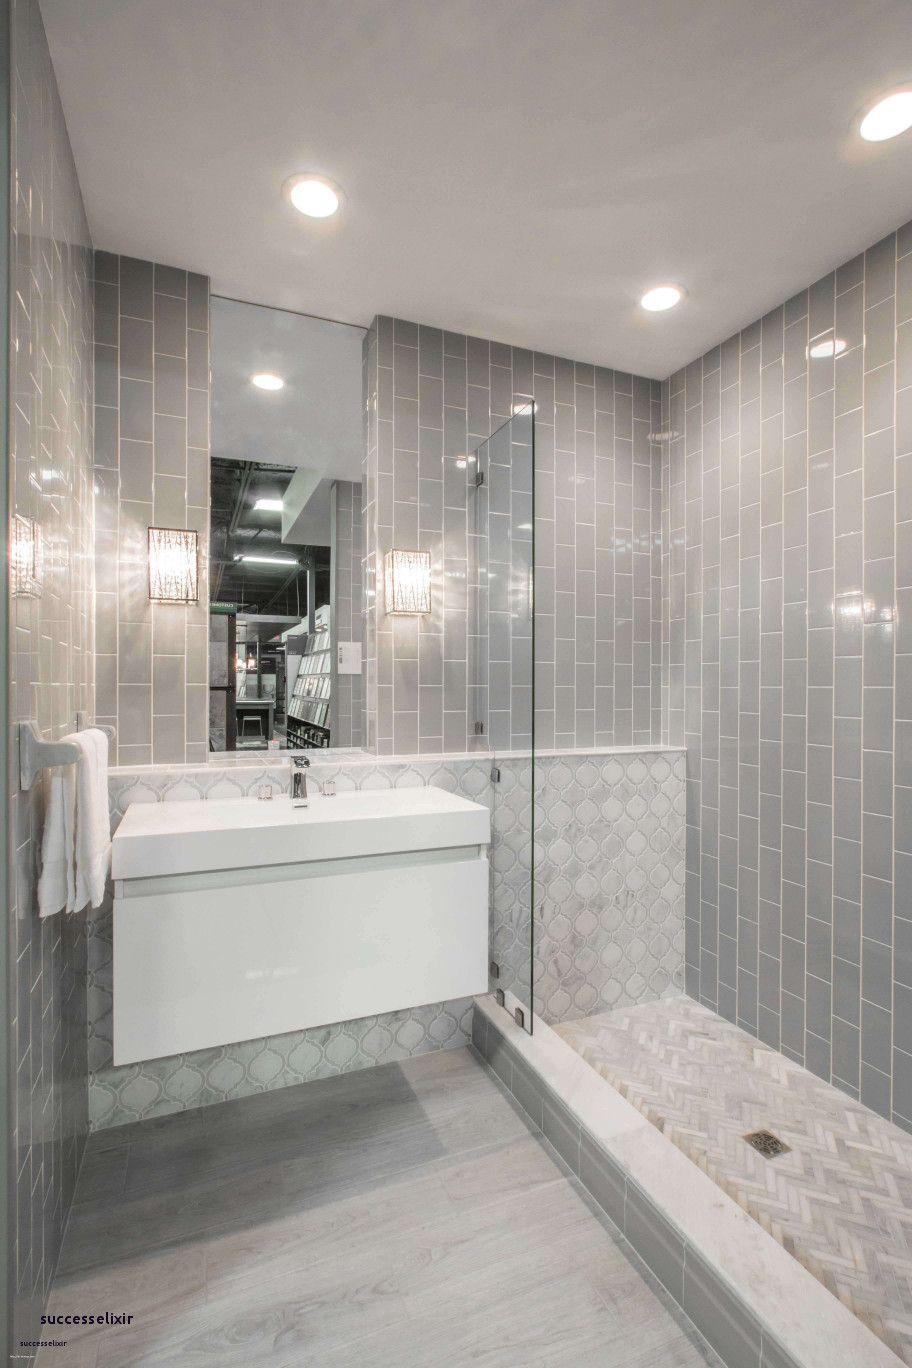 29 Beautiful Bathroom Floor Design Best Option For 2019 In 2020 Modern Bathroom Remodel Bathroom Interior Design Diy Bathroom Remodel